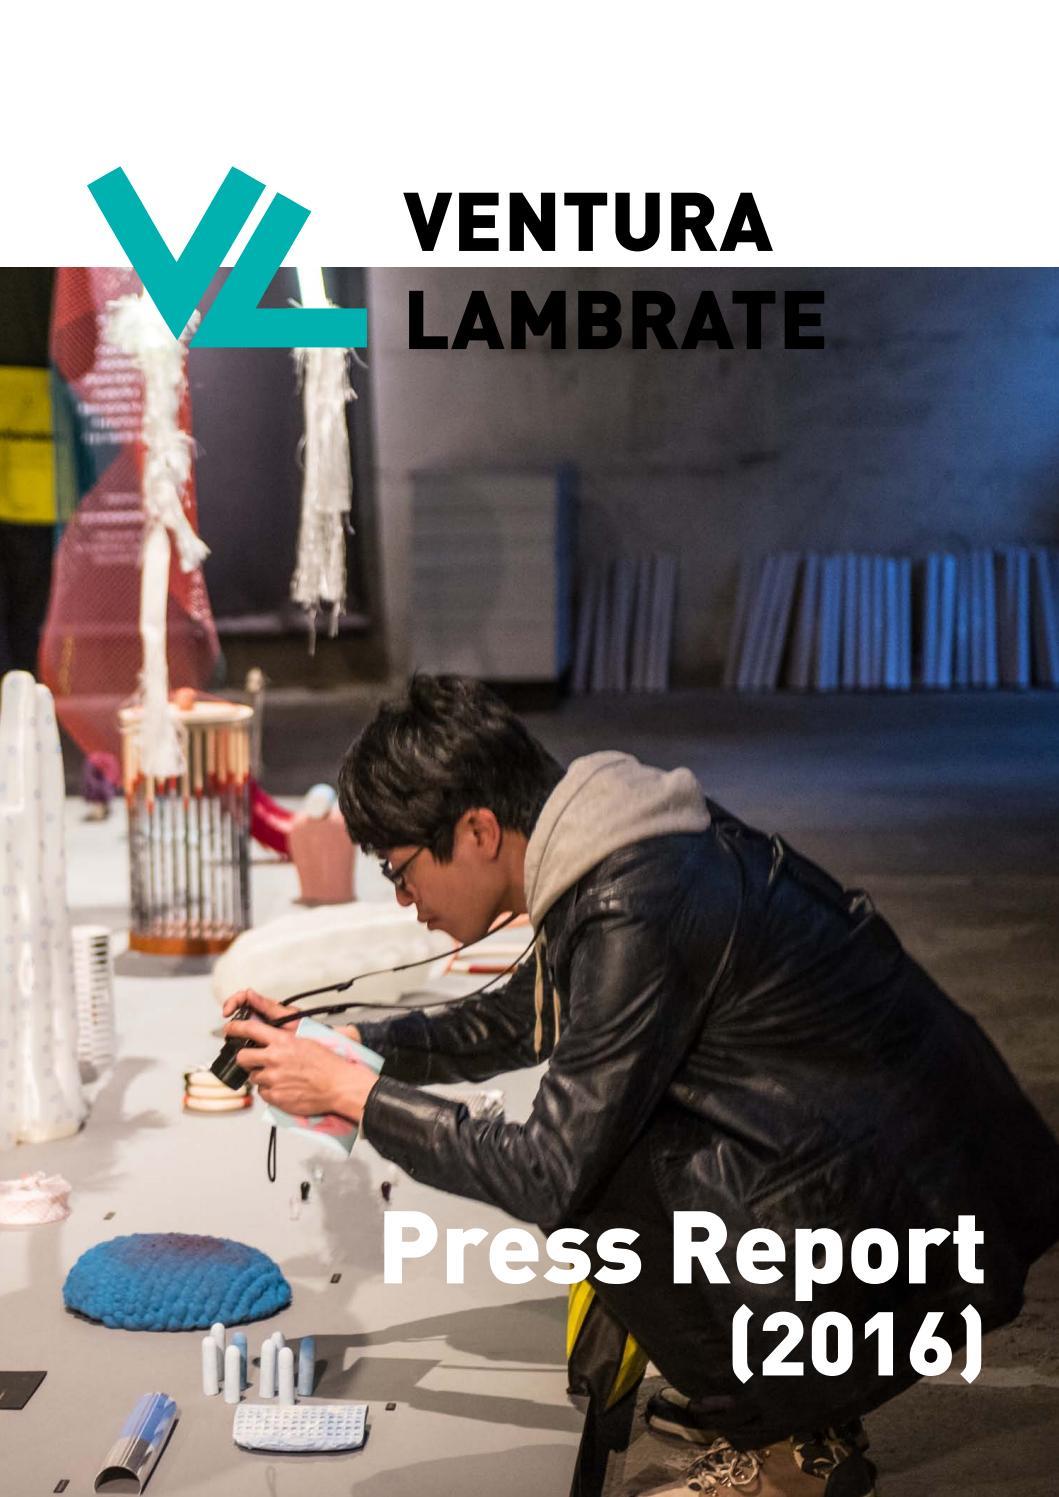 Ventura Lambrate Press Report 2016 By Ventura Projects Issuu